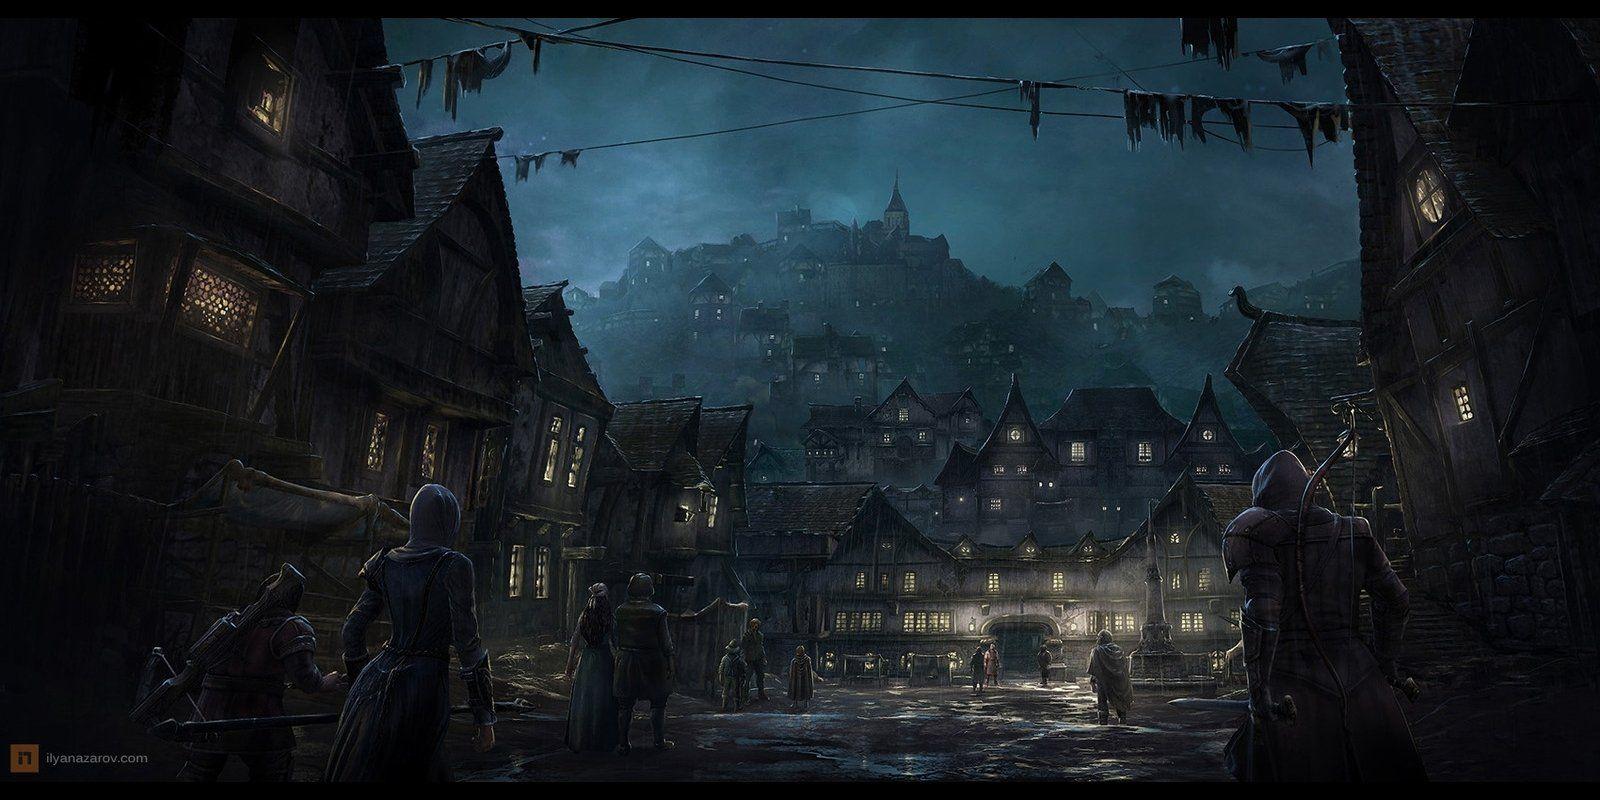 Thumb 1920 387254 Jpg 1600 800 Fantasy Town Concept Art World Fantasy Landscape